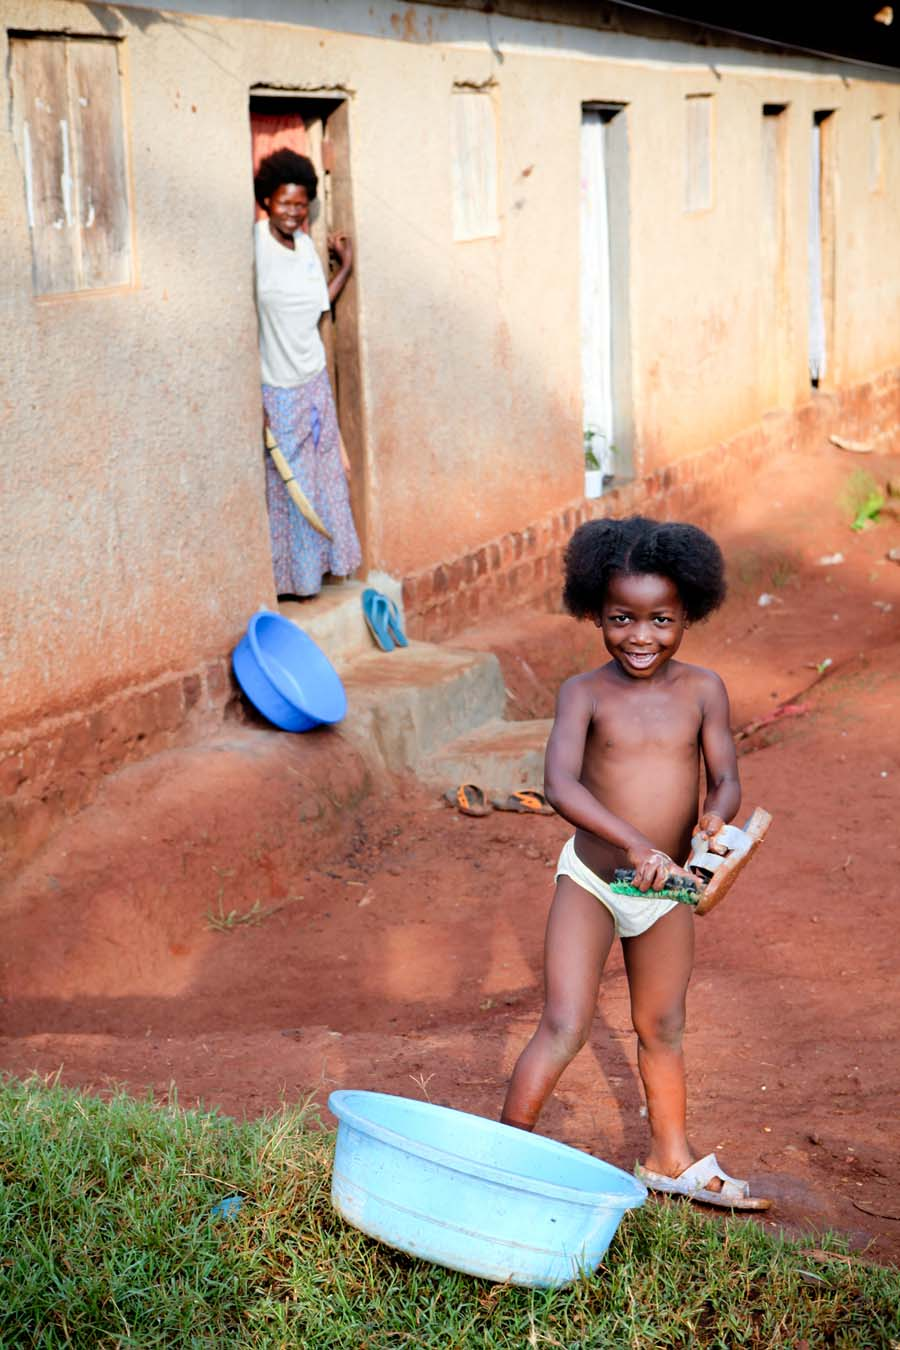 jessicadavisphotography.com | Jessica Davis Photography | Portrait Work in Uganda| Travel Photographer | World Event Photographs 8 (9).jpg